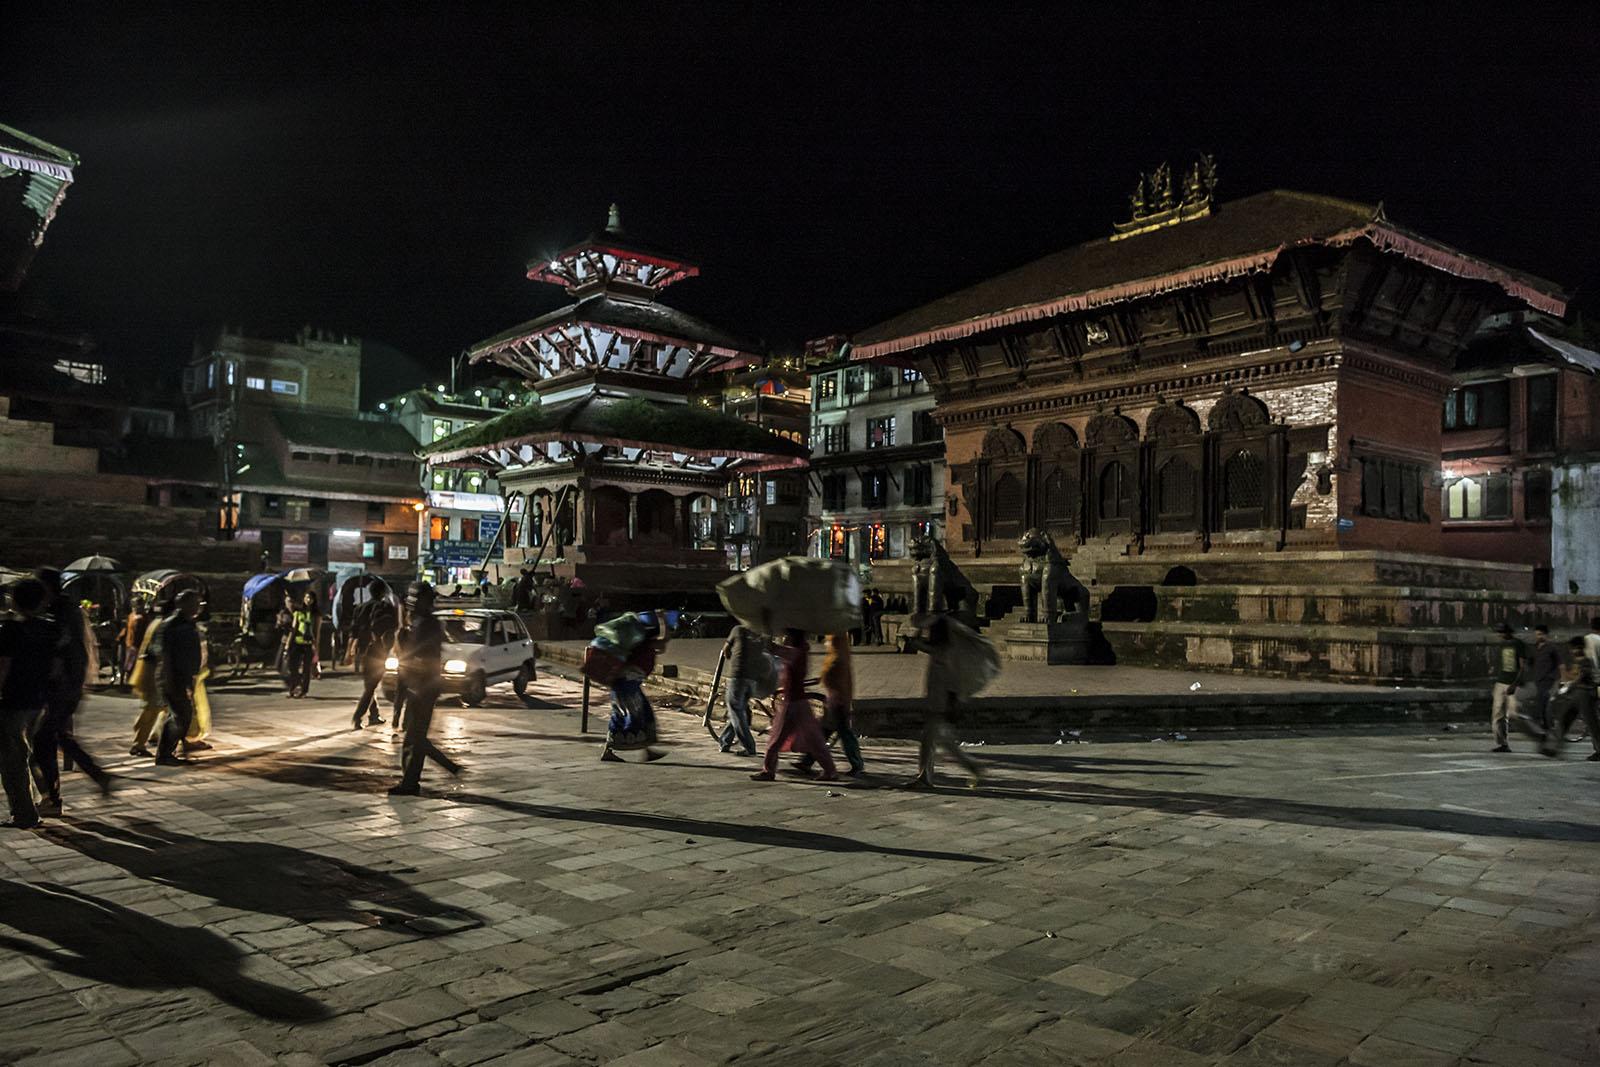 Beggars Nepal Street Beautiful